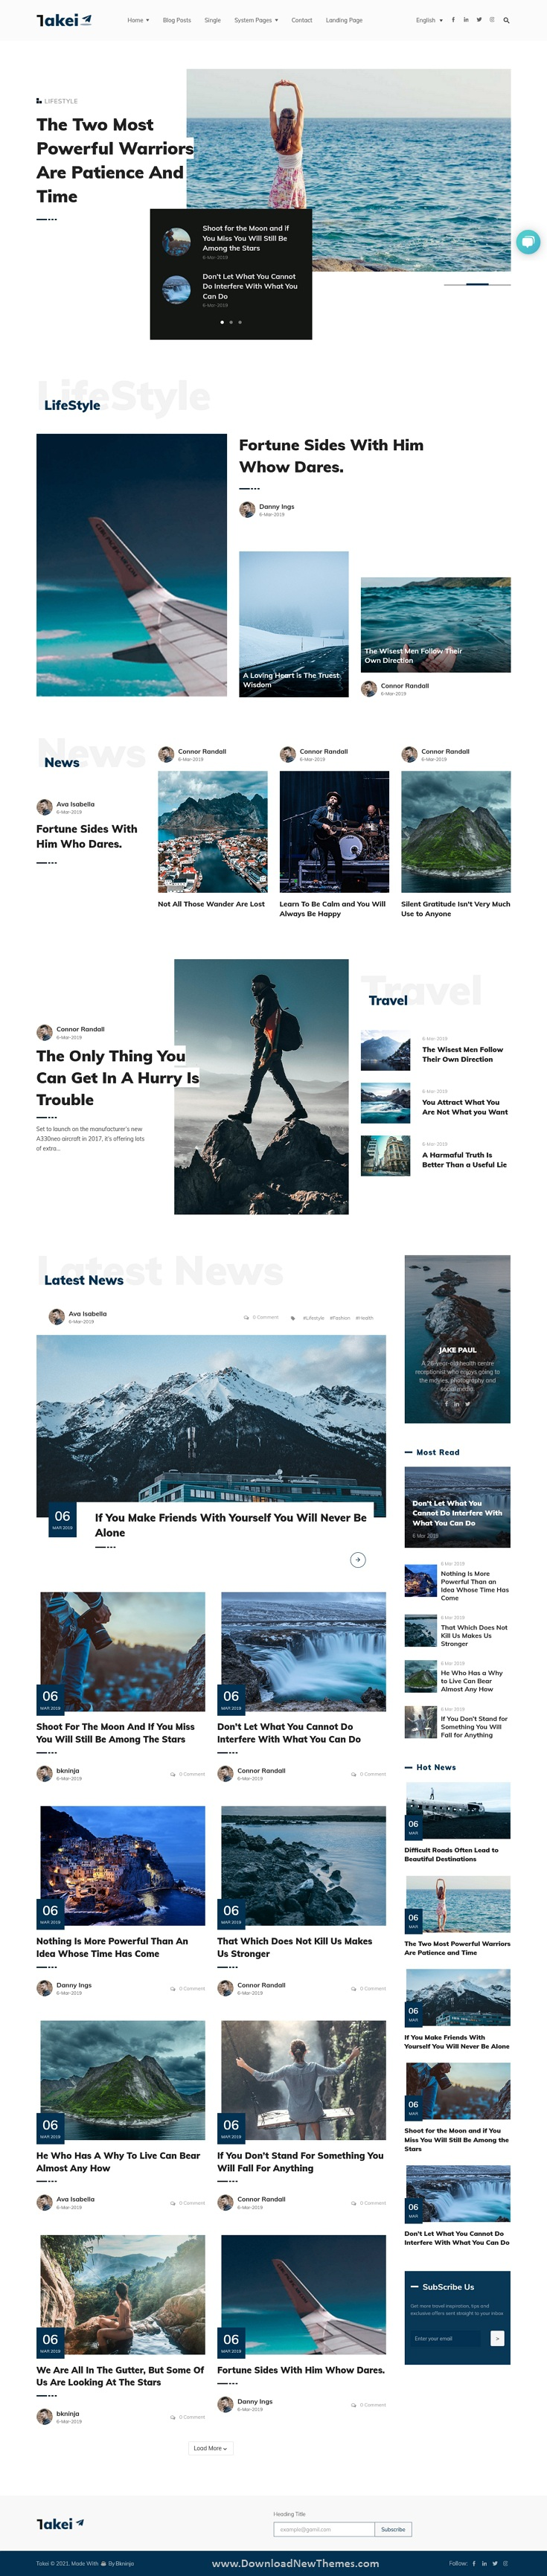 Blog and Magazine HubSpot CMS Theme